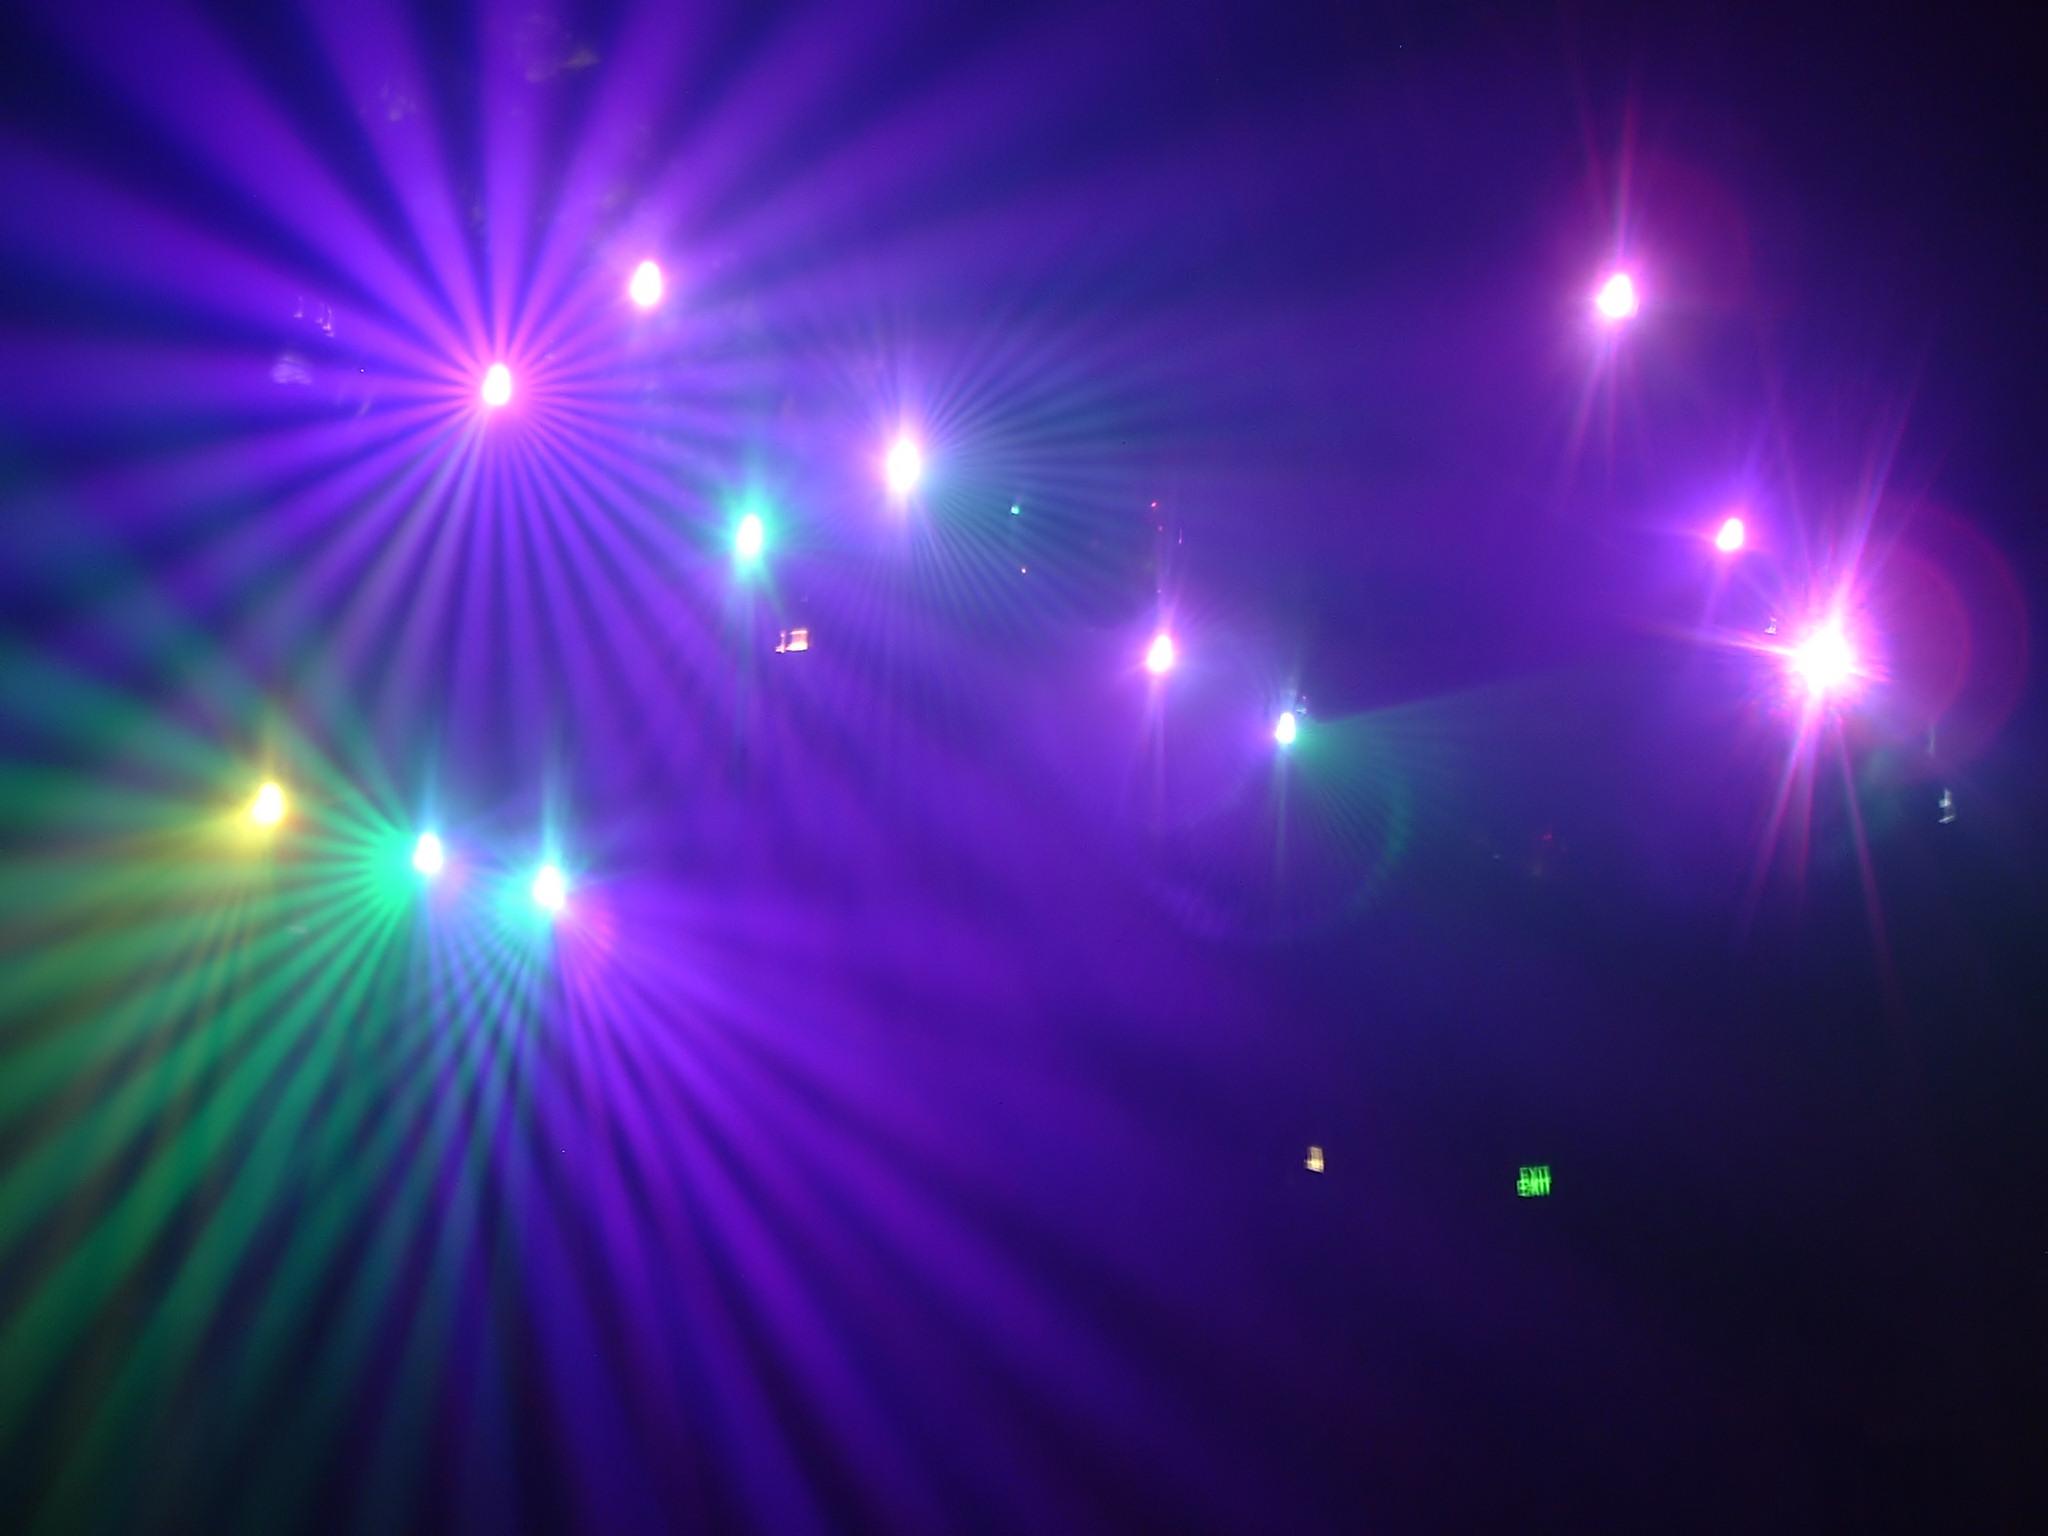 Nightclub Lights Background Stage Light Stock Photography